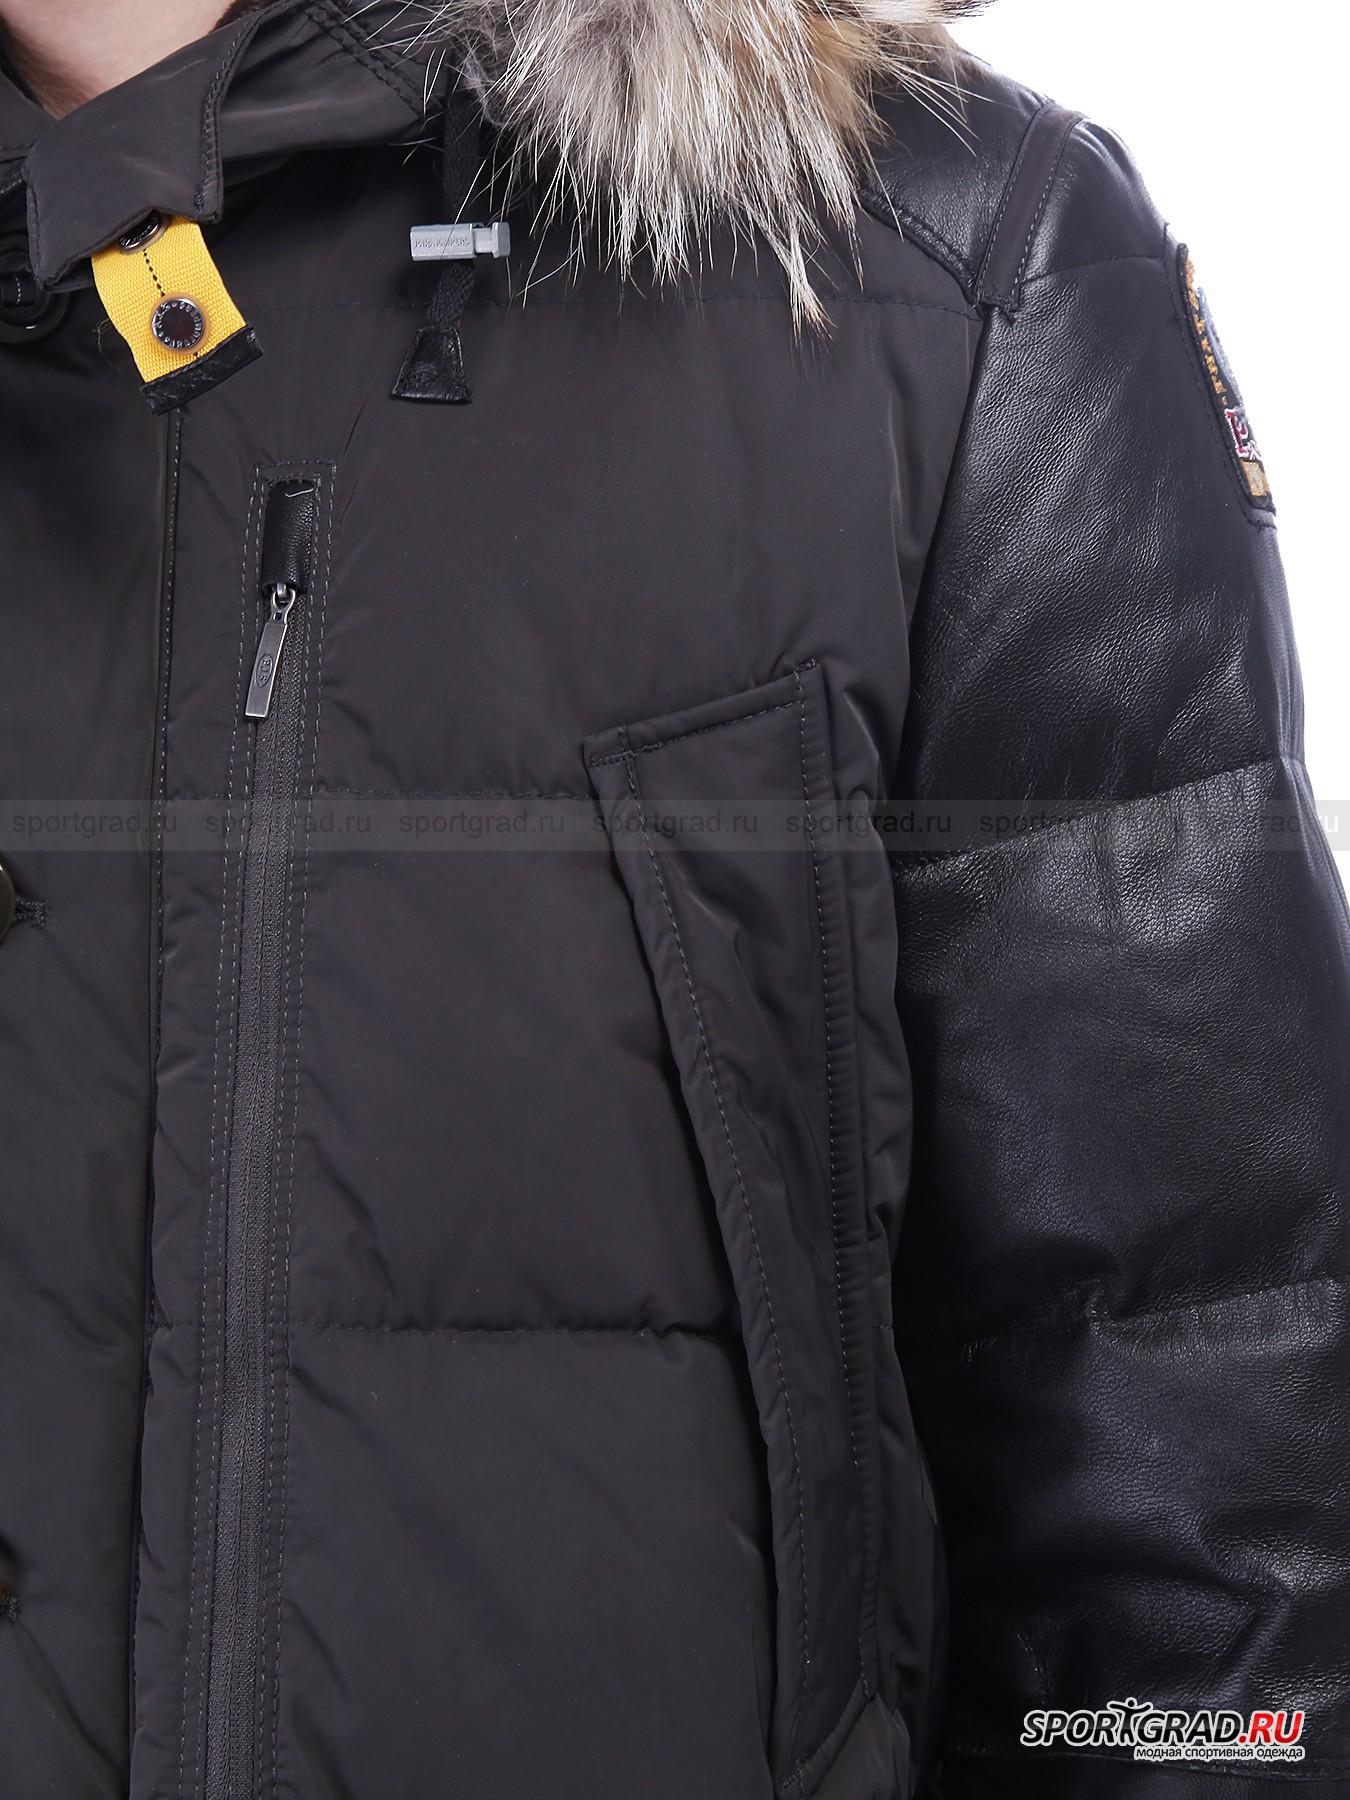 Куртка мужская Dhole PARAJUMPERS от Спортград